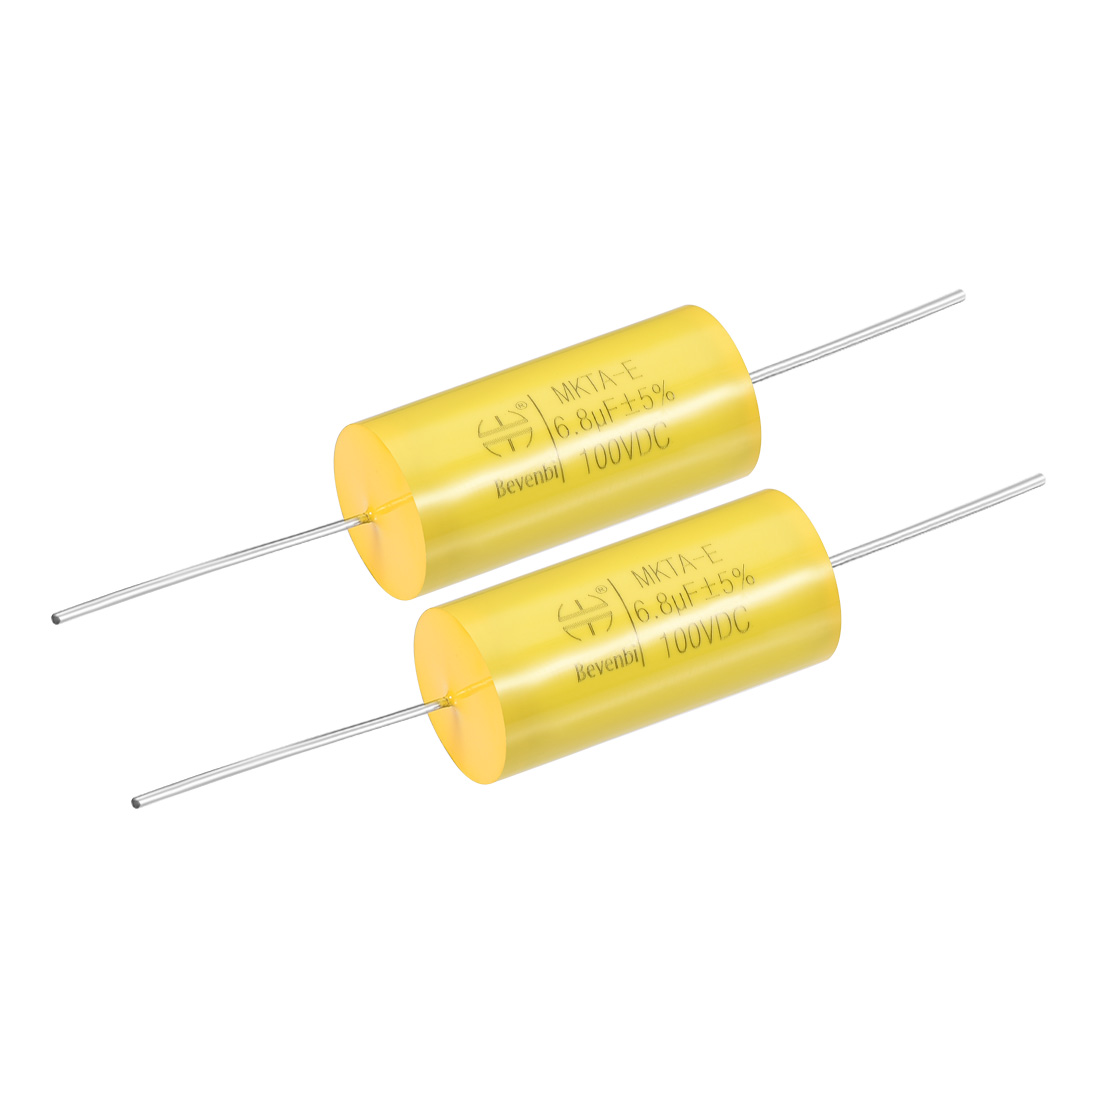 Film Capacitor 100V DC 6.8uF MKTA-E Round Polypropylene Capacitors Yellow 2pcs